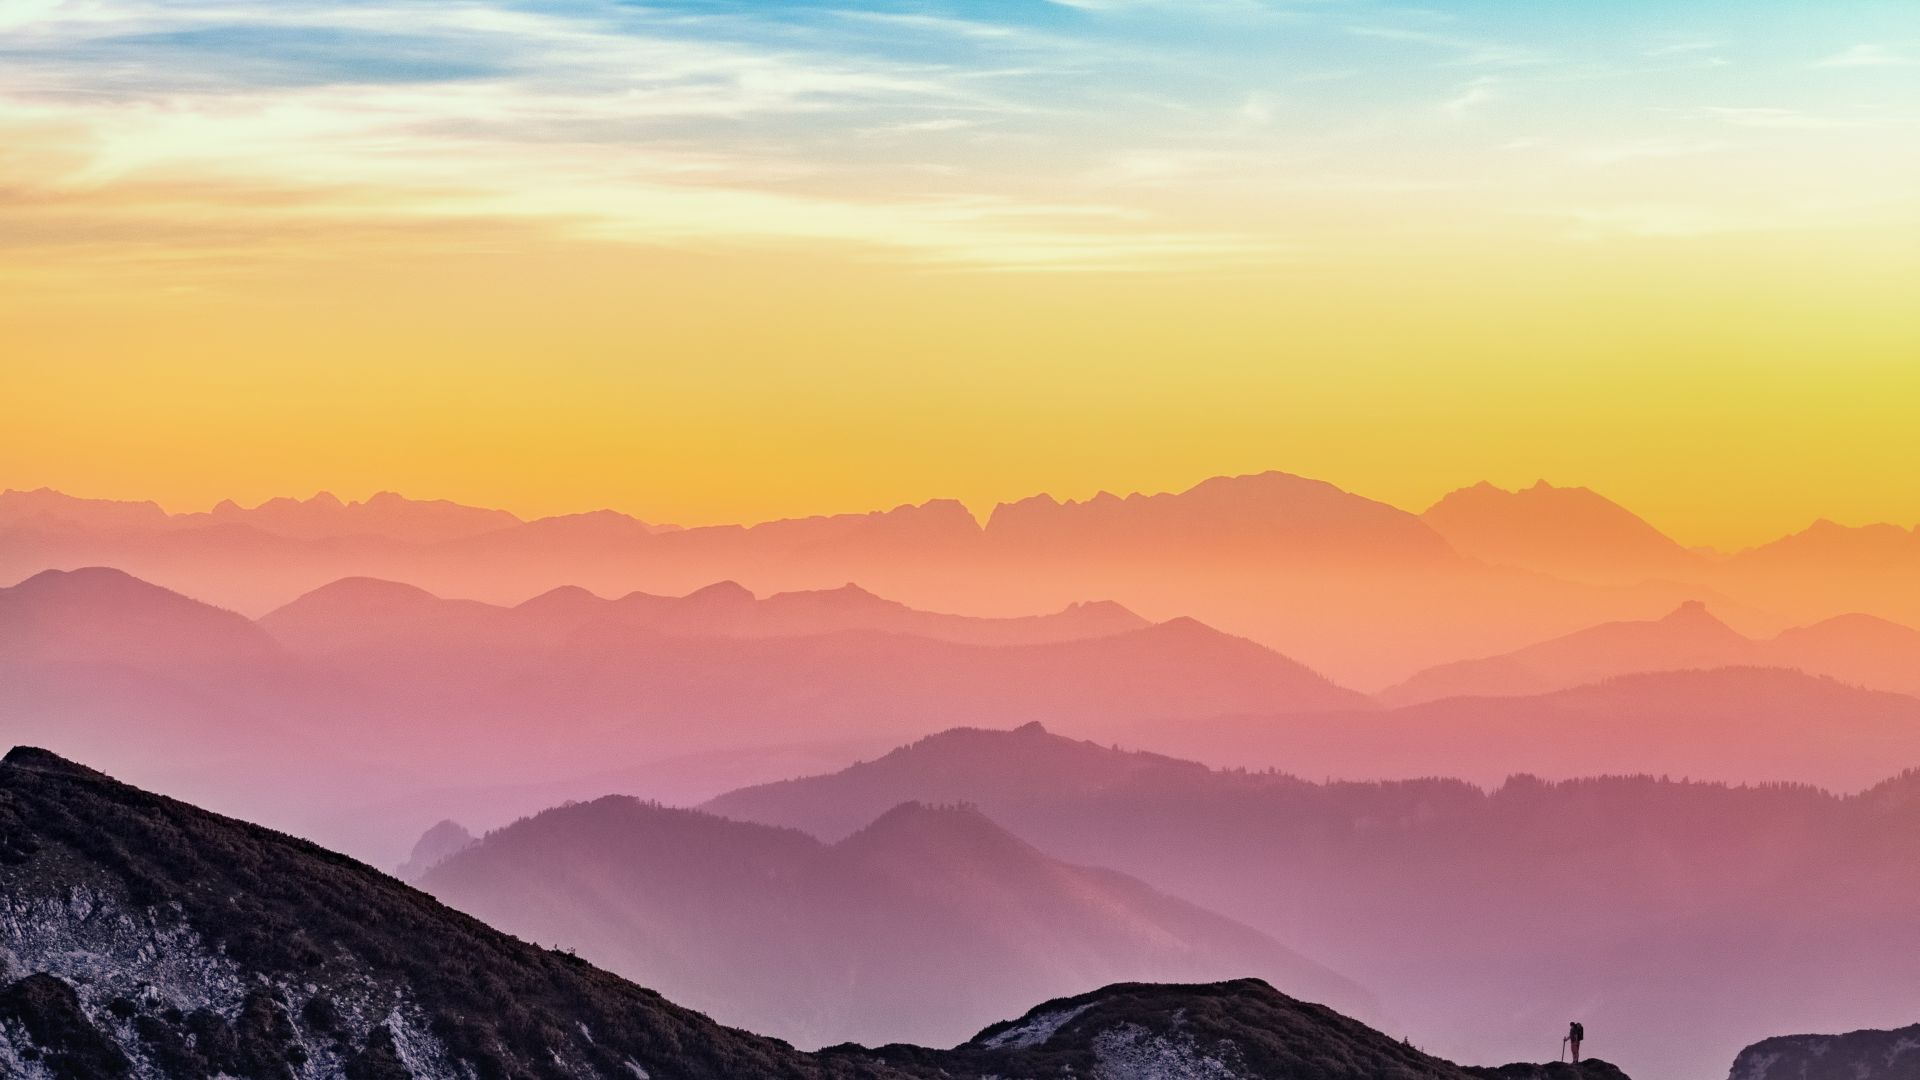 Wallpaper Sunset, horizon, mountains, nature, 4k